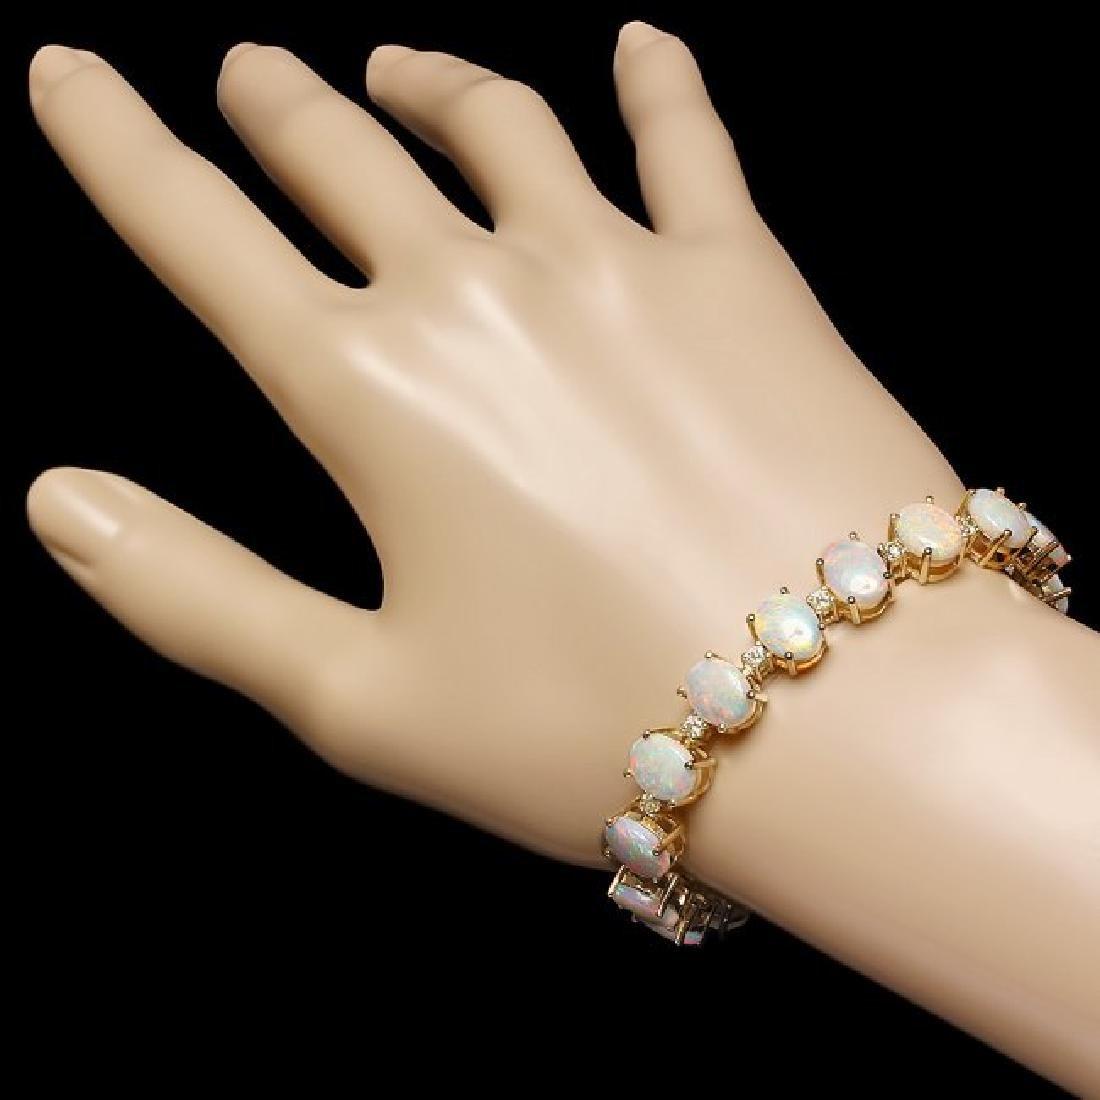 14k Gold 18.00ct Opal 1.50ct Diamond Bracelet - 5